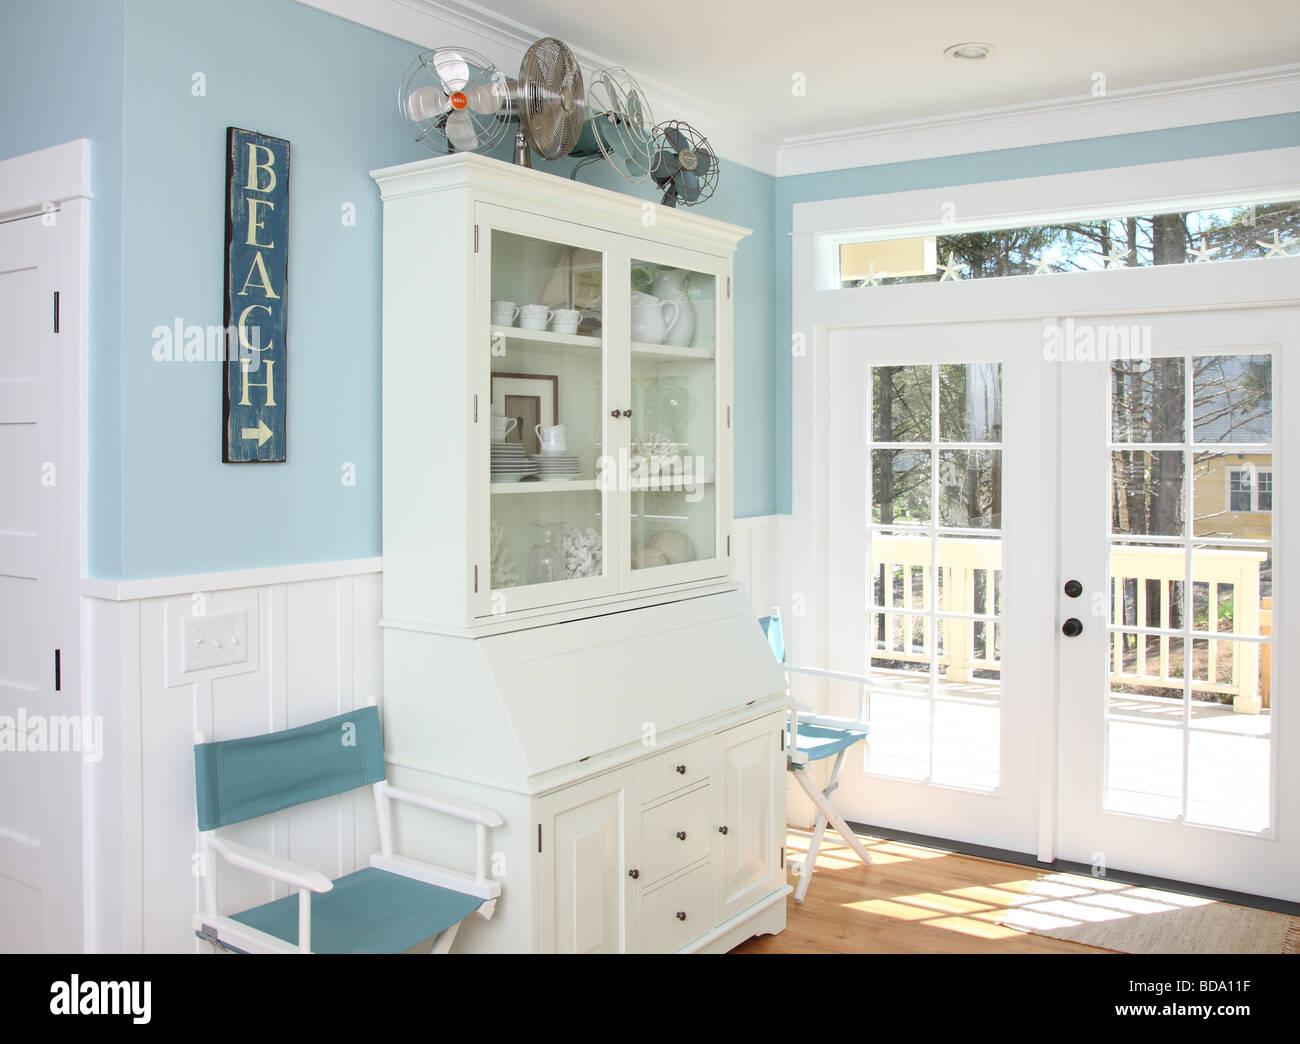 Beach house interior Stock Photo Royalty Free Image 25421243 Alamy